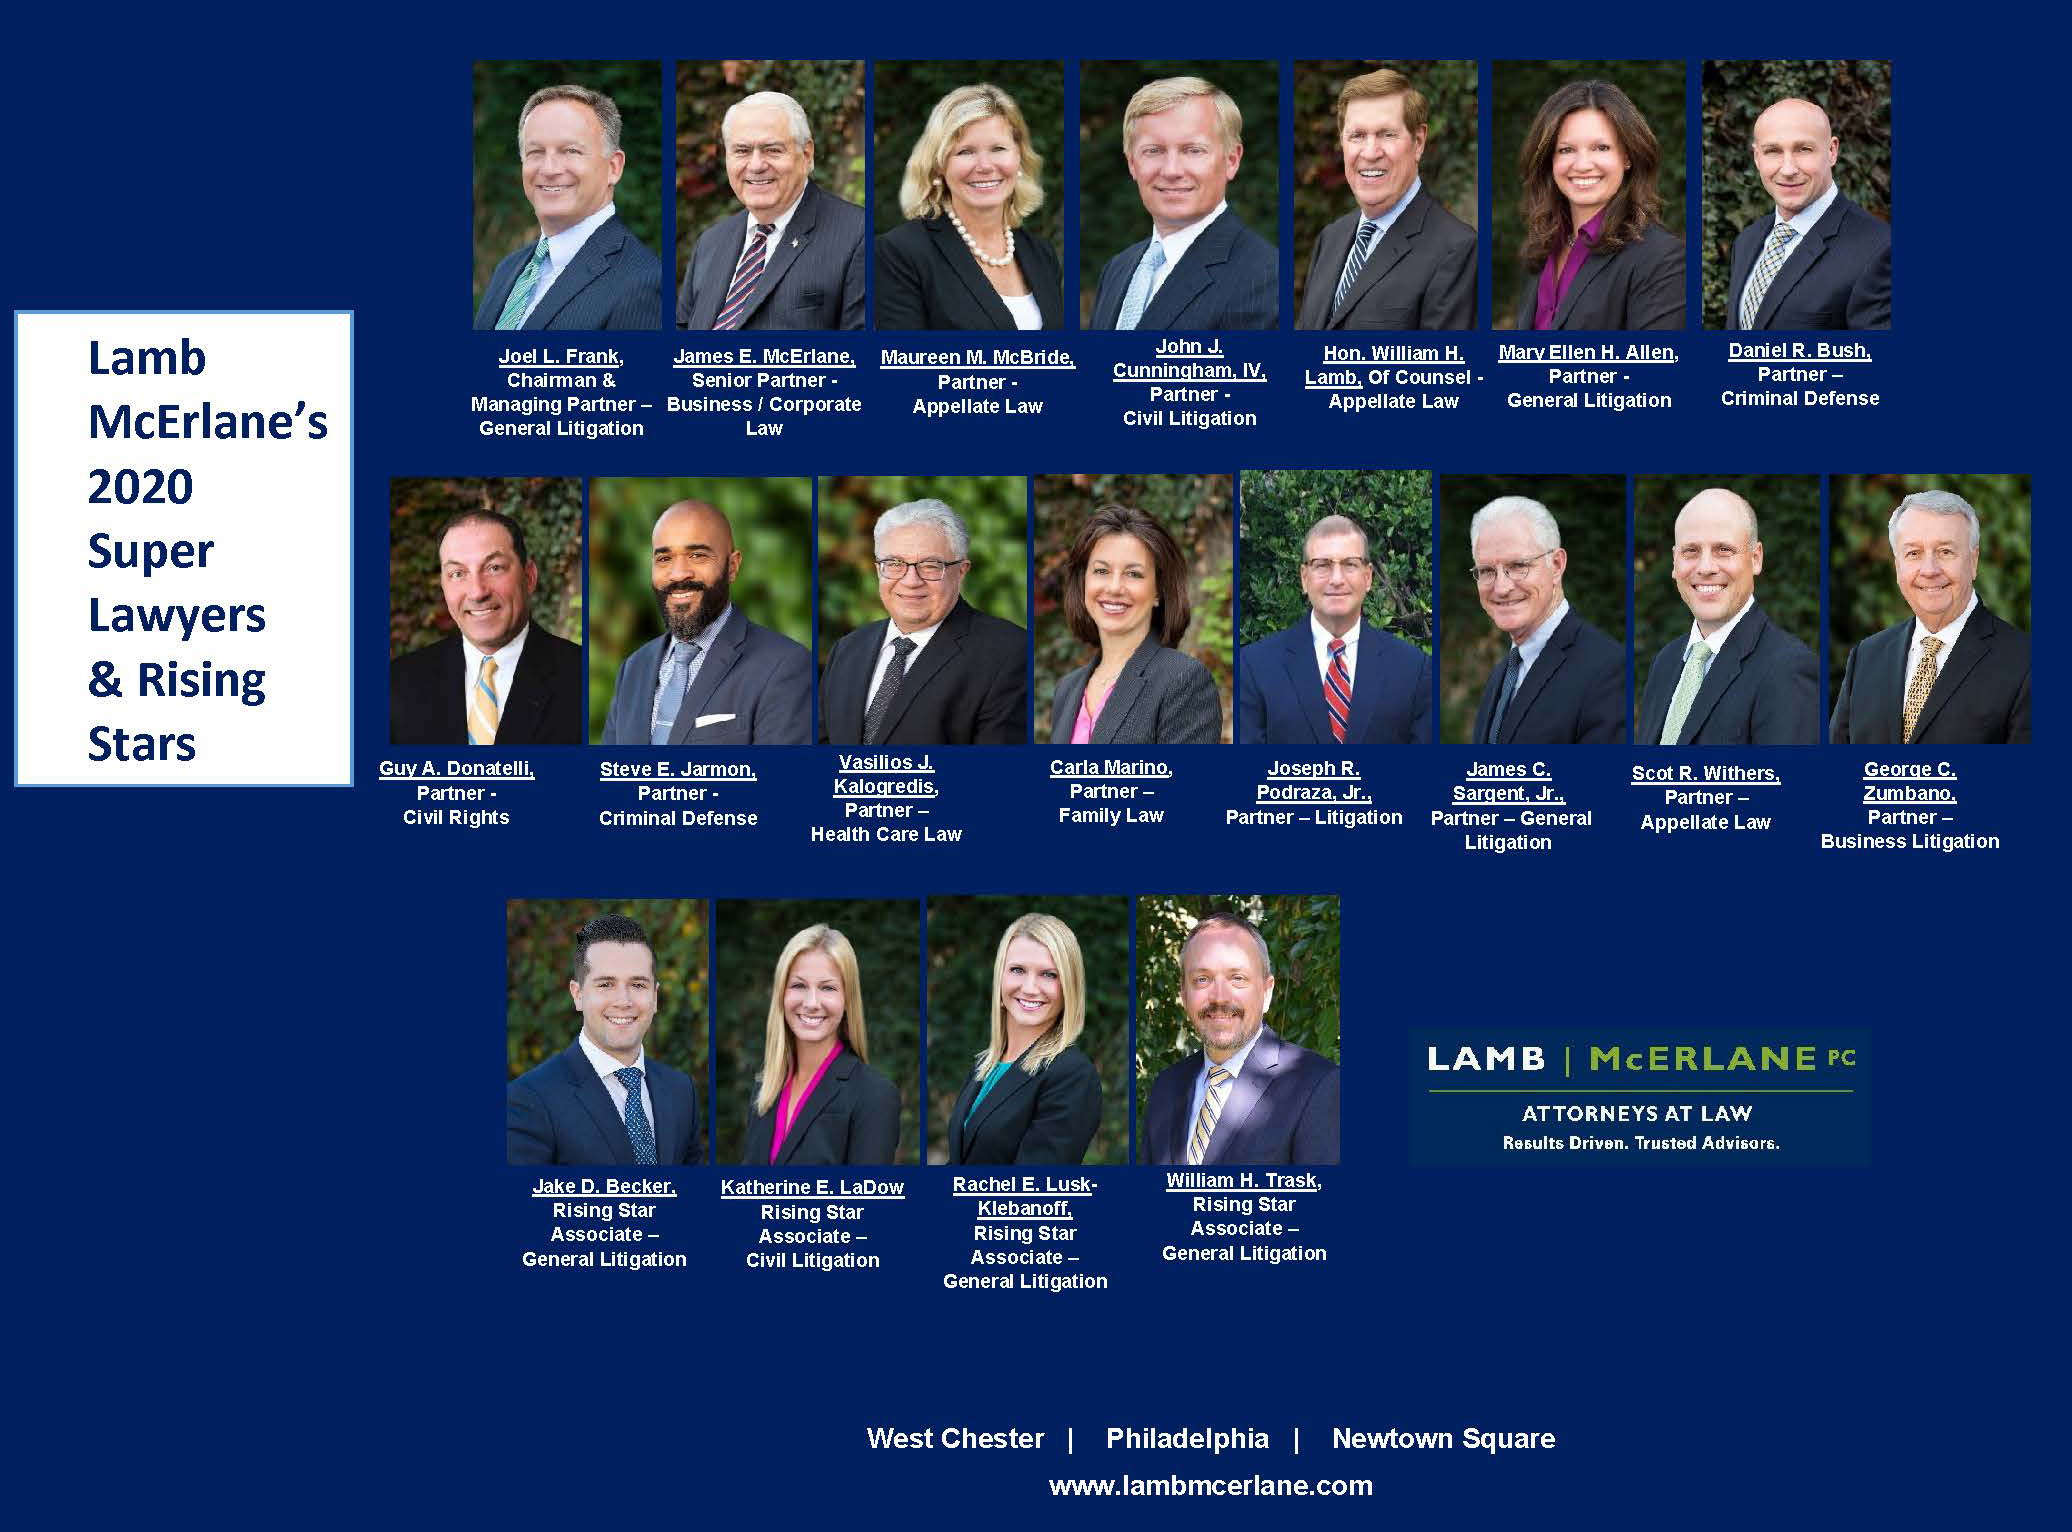 Nineteen Lamb McErlane Attorneys Named 2020 Pennsylvania Super Lawyers, Rising Stars